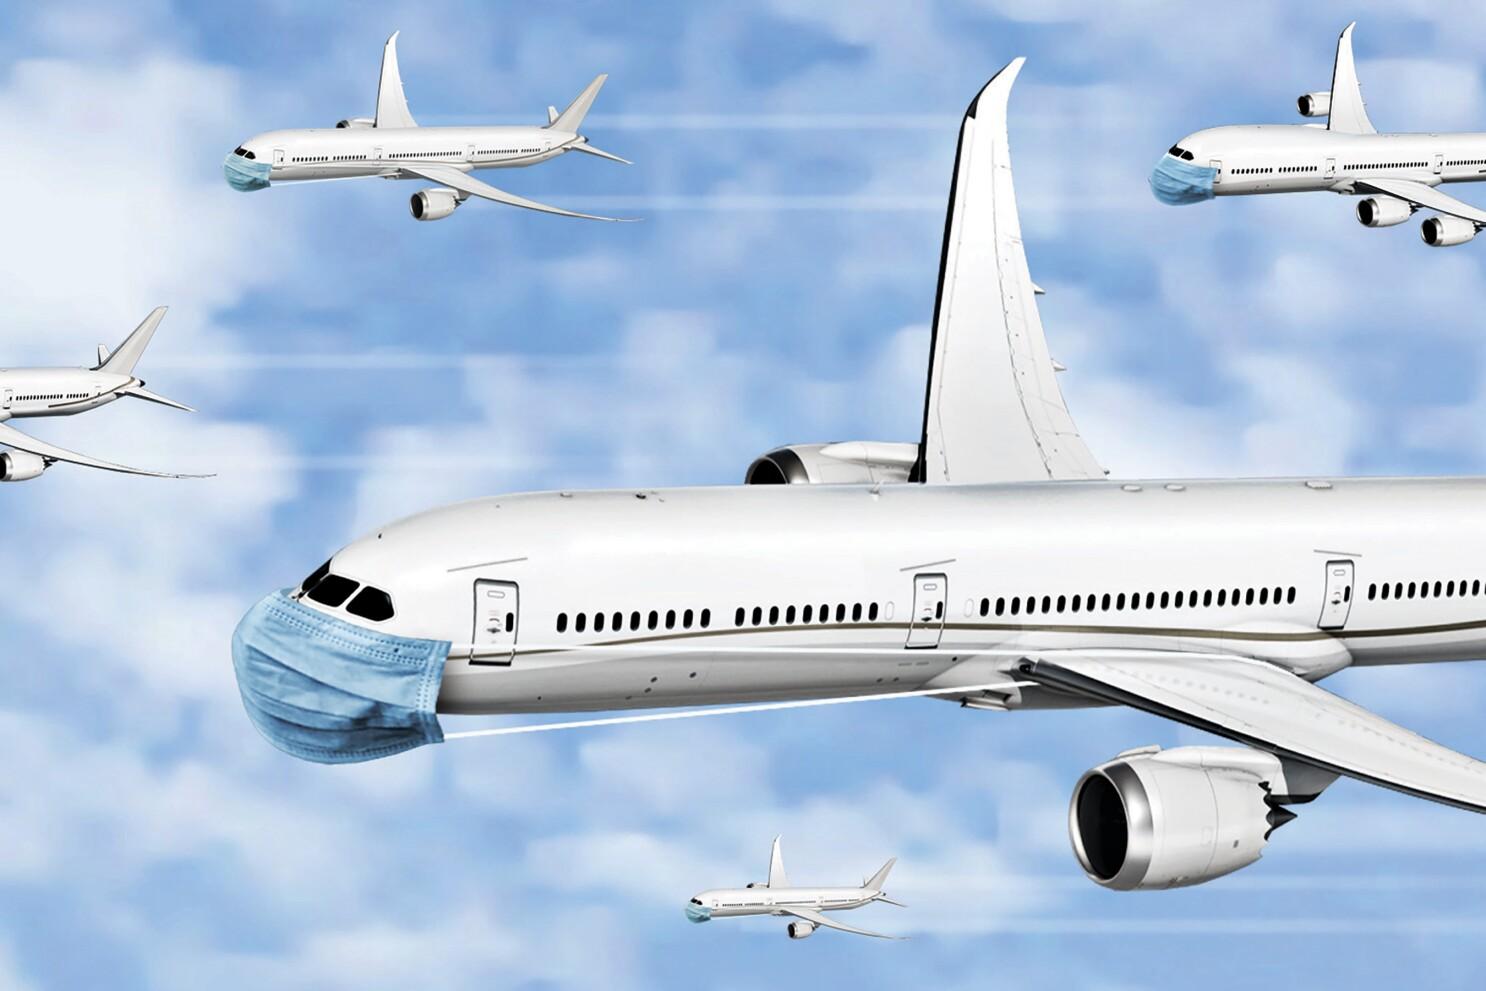 Coronavirus stories: Flight attendant tests positive - Los Angeles Times